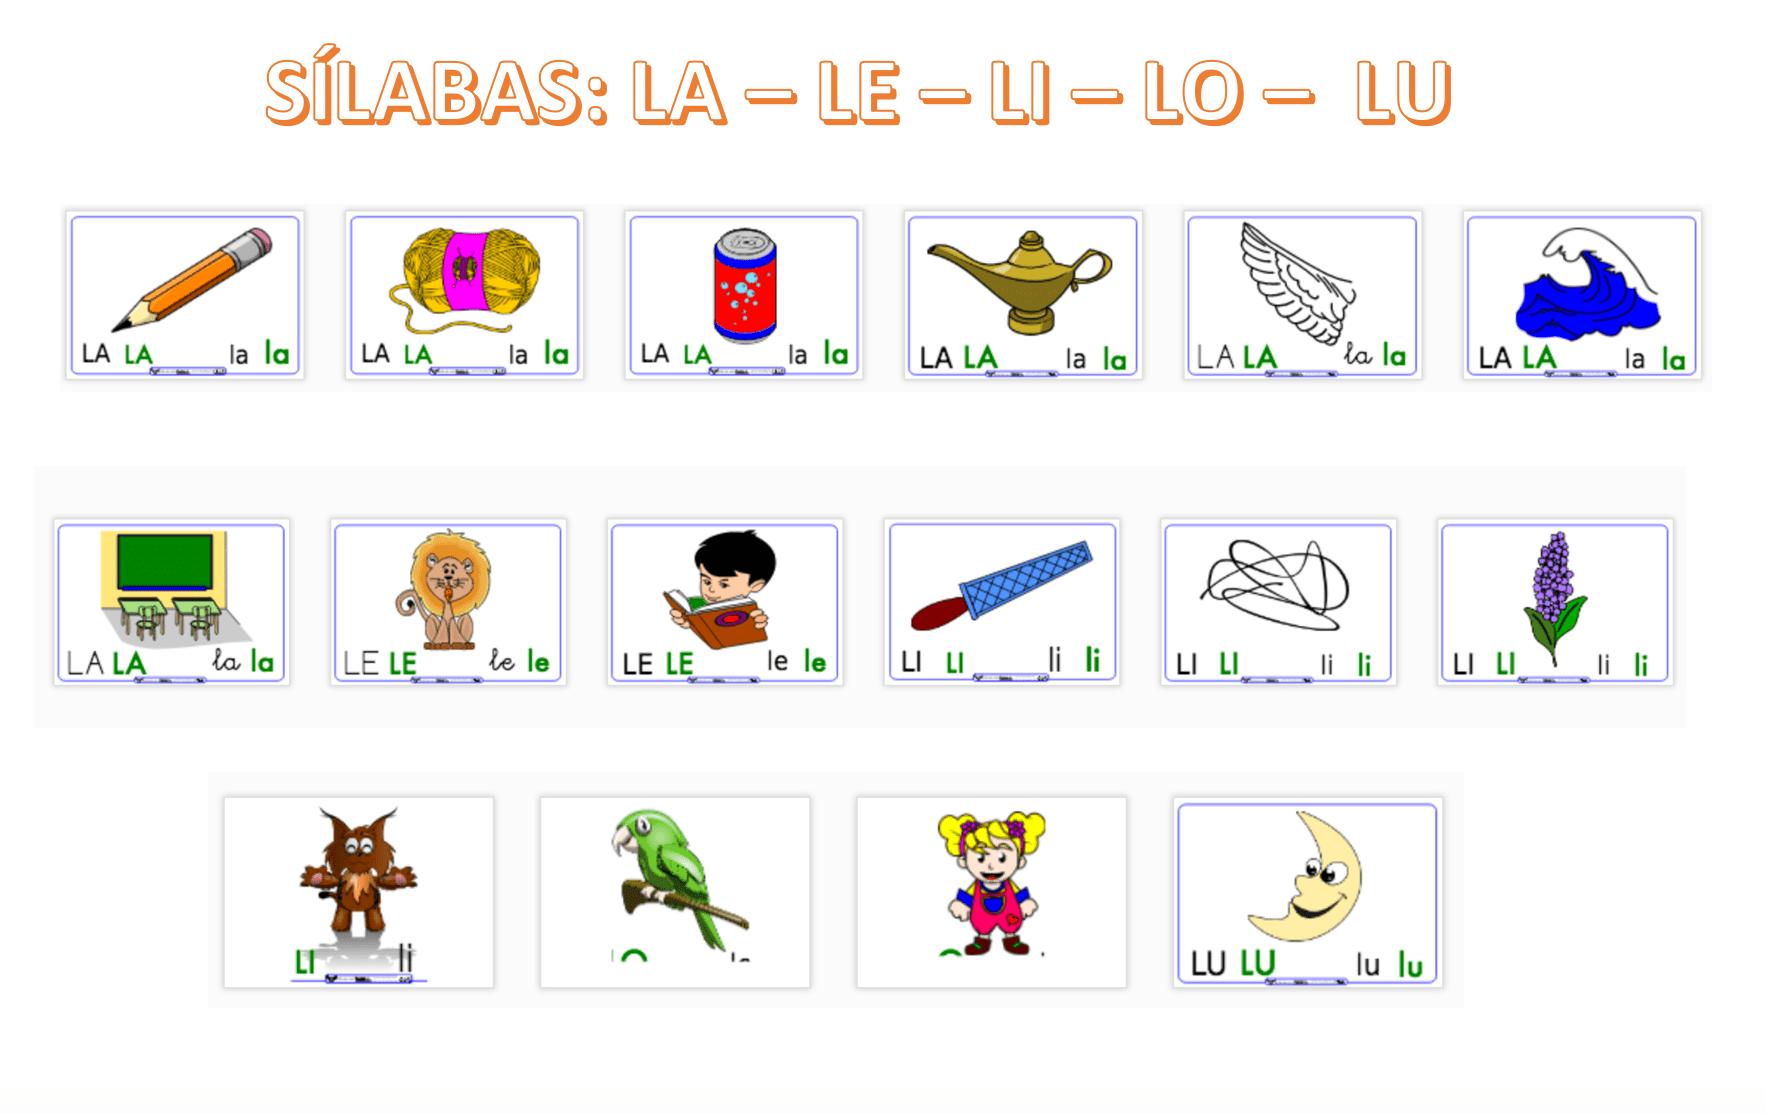 Dibujos Con Silabas La Le Li Lo Lu